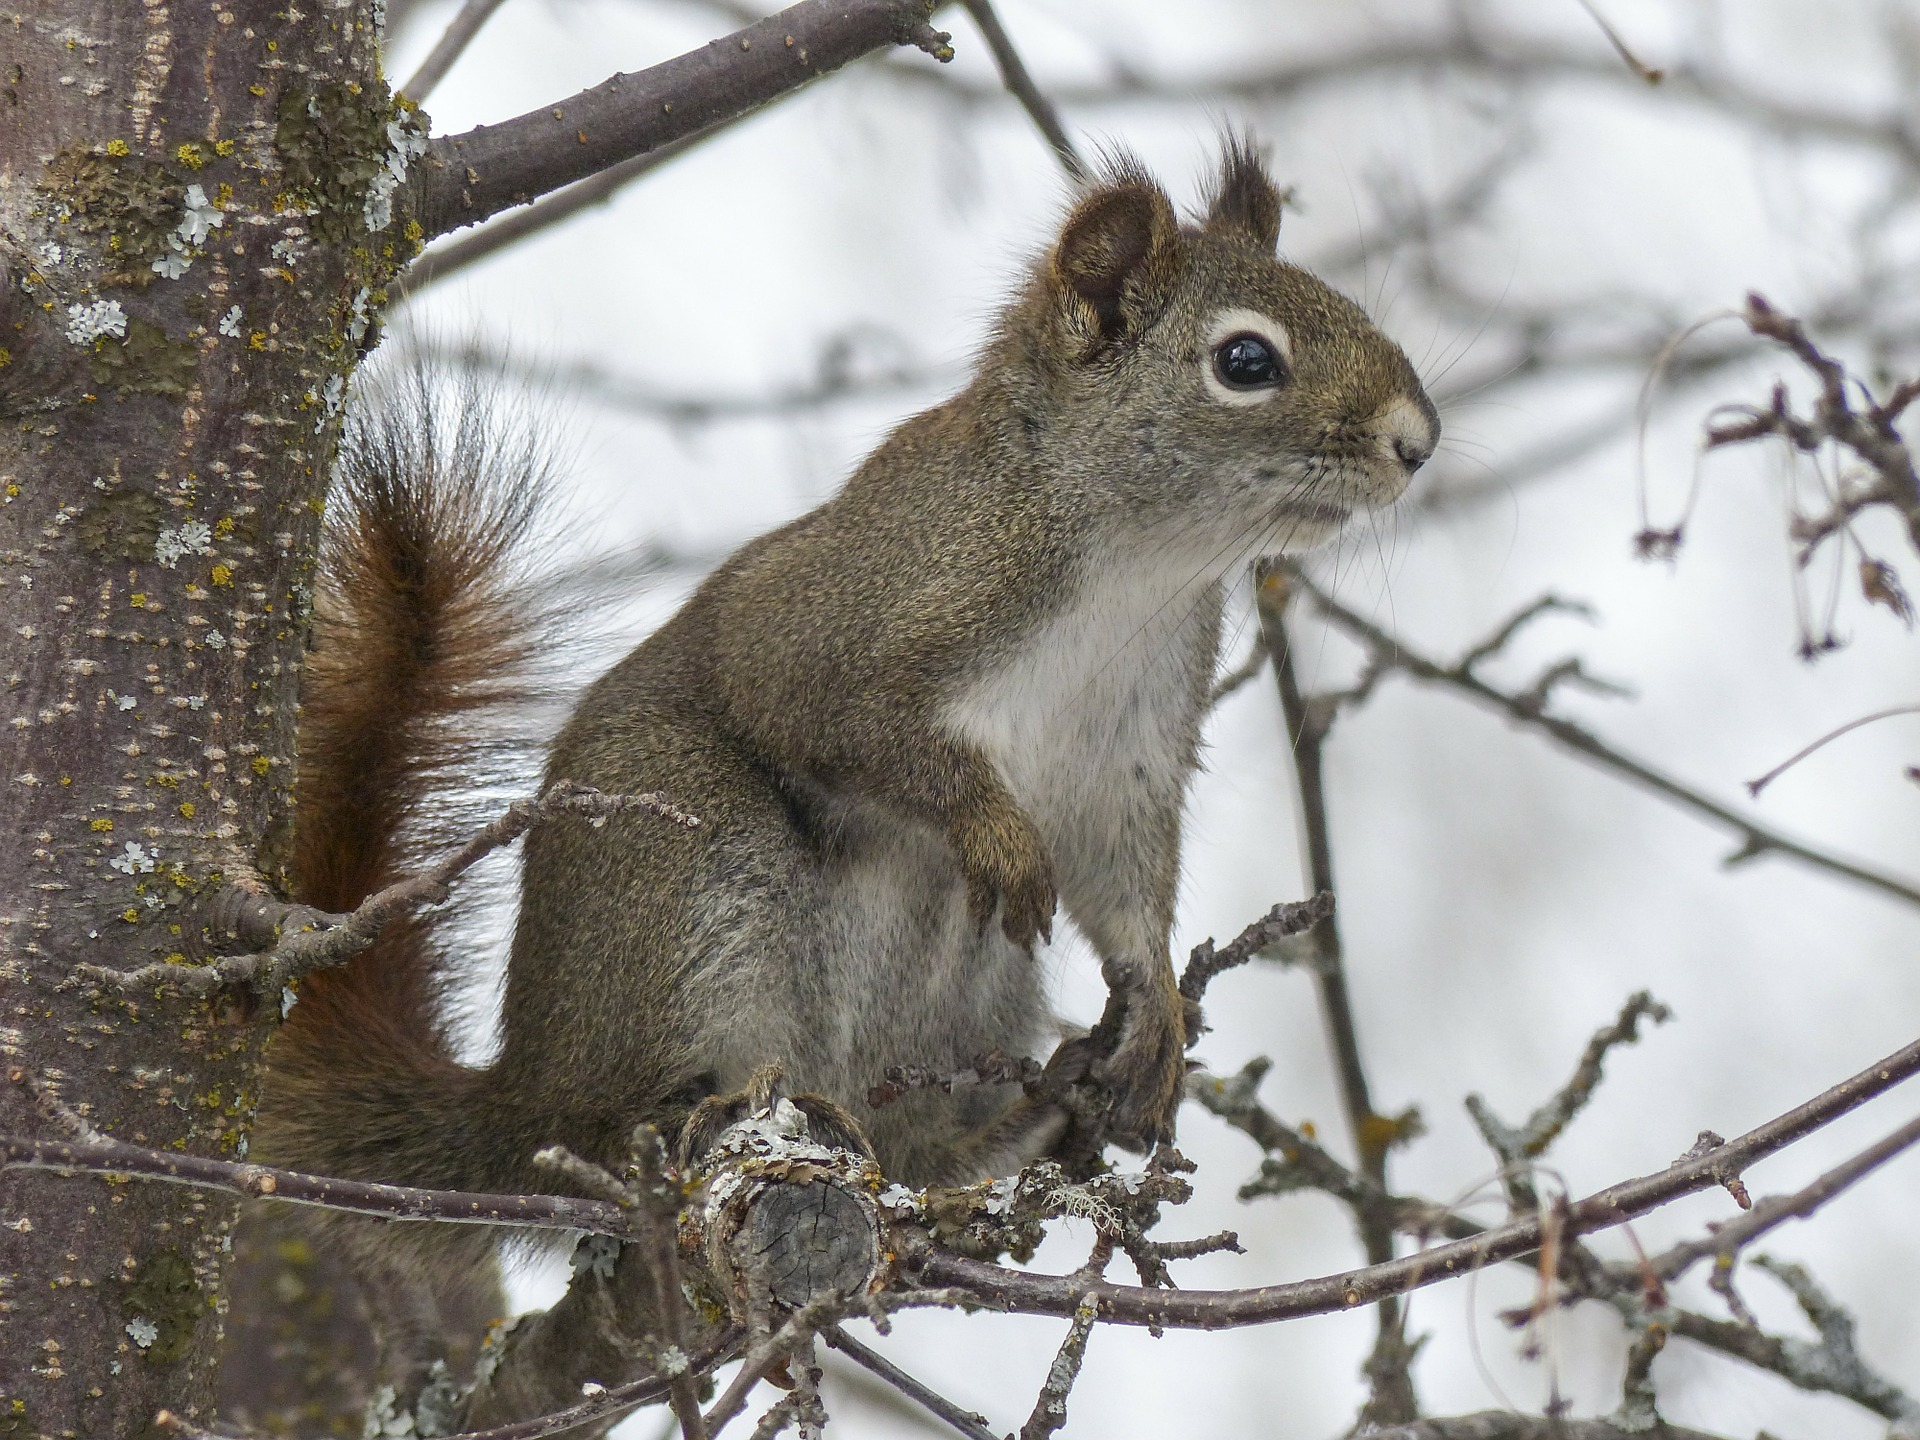 squirrel-300223_1920.jpg